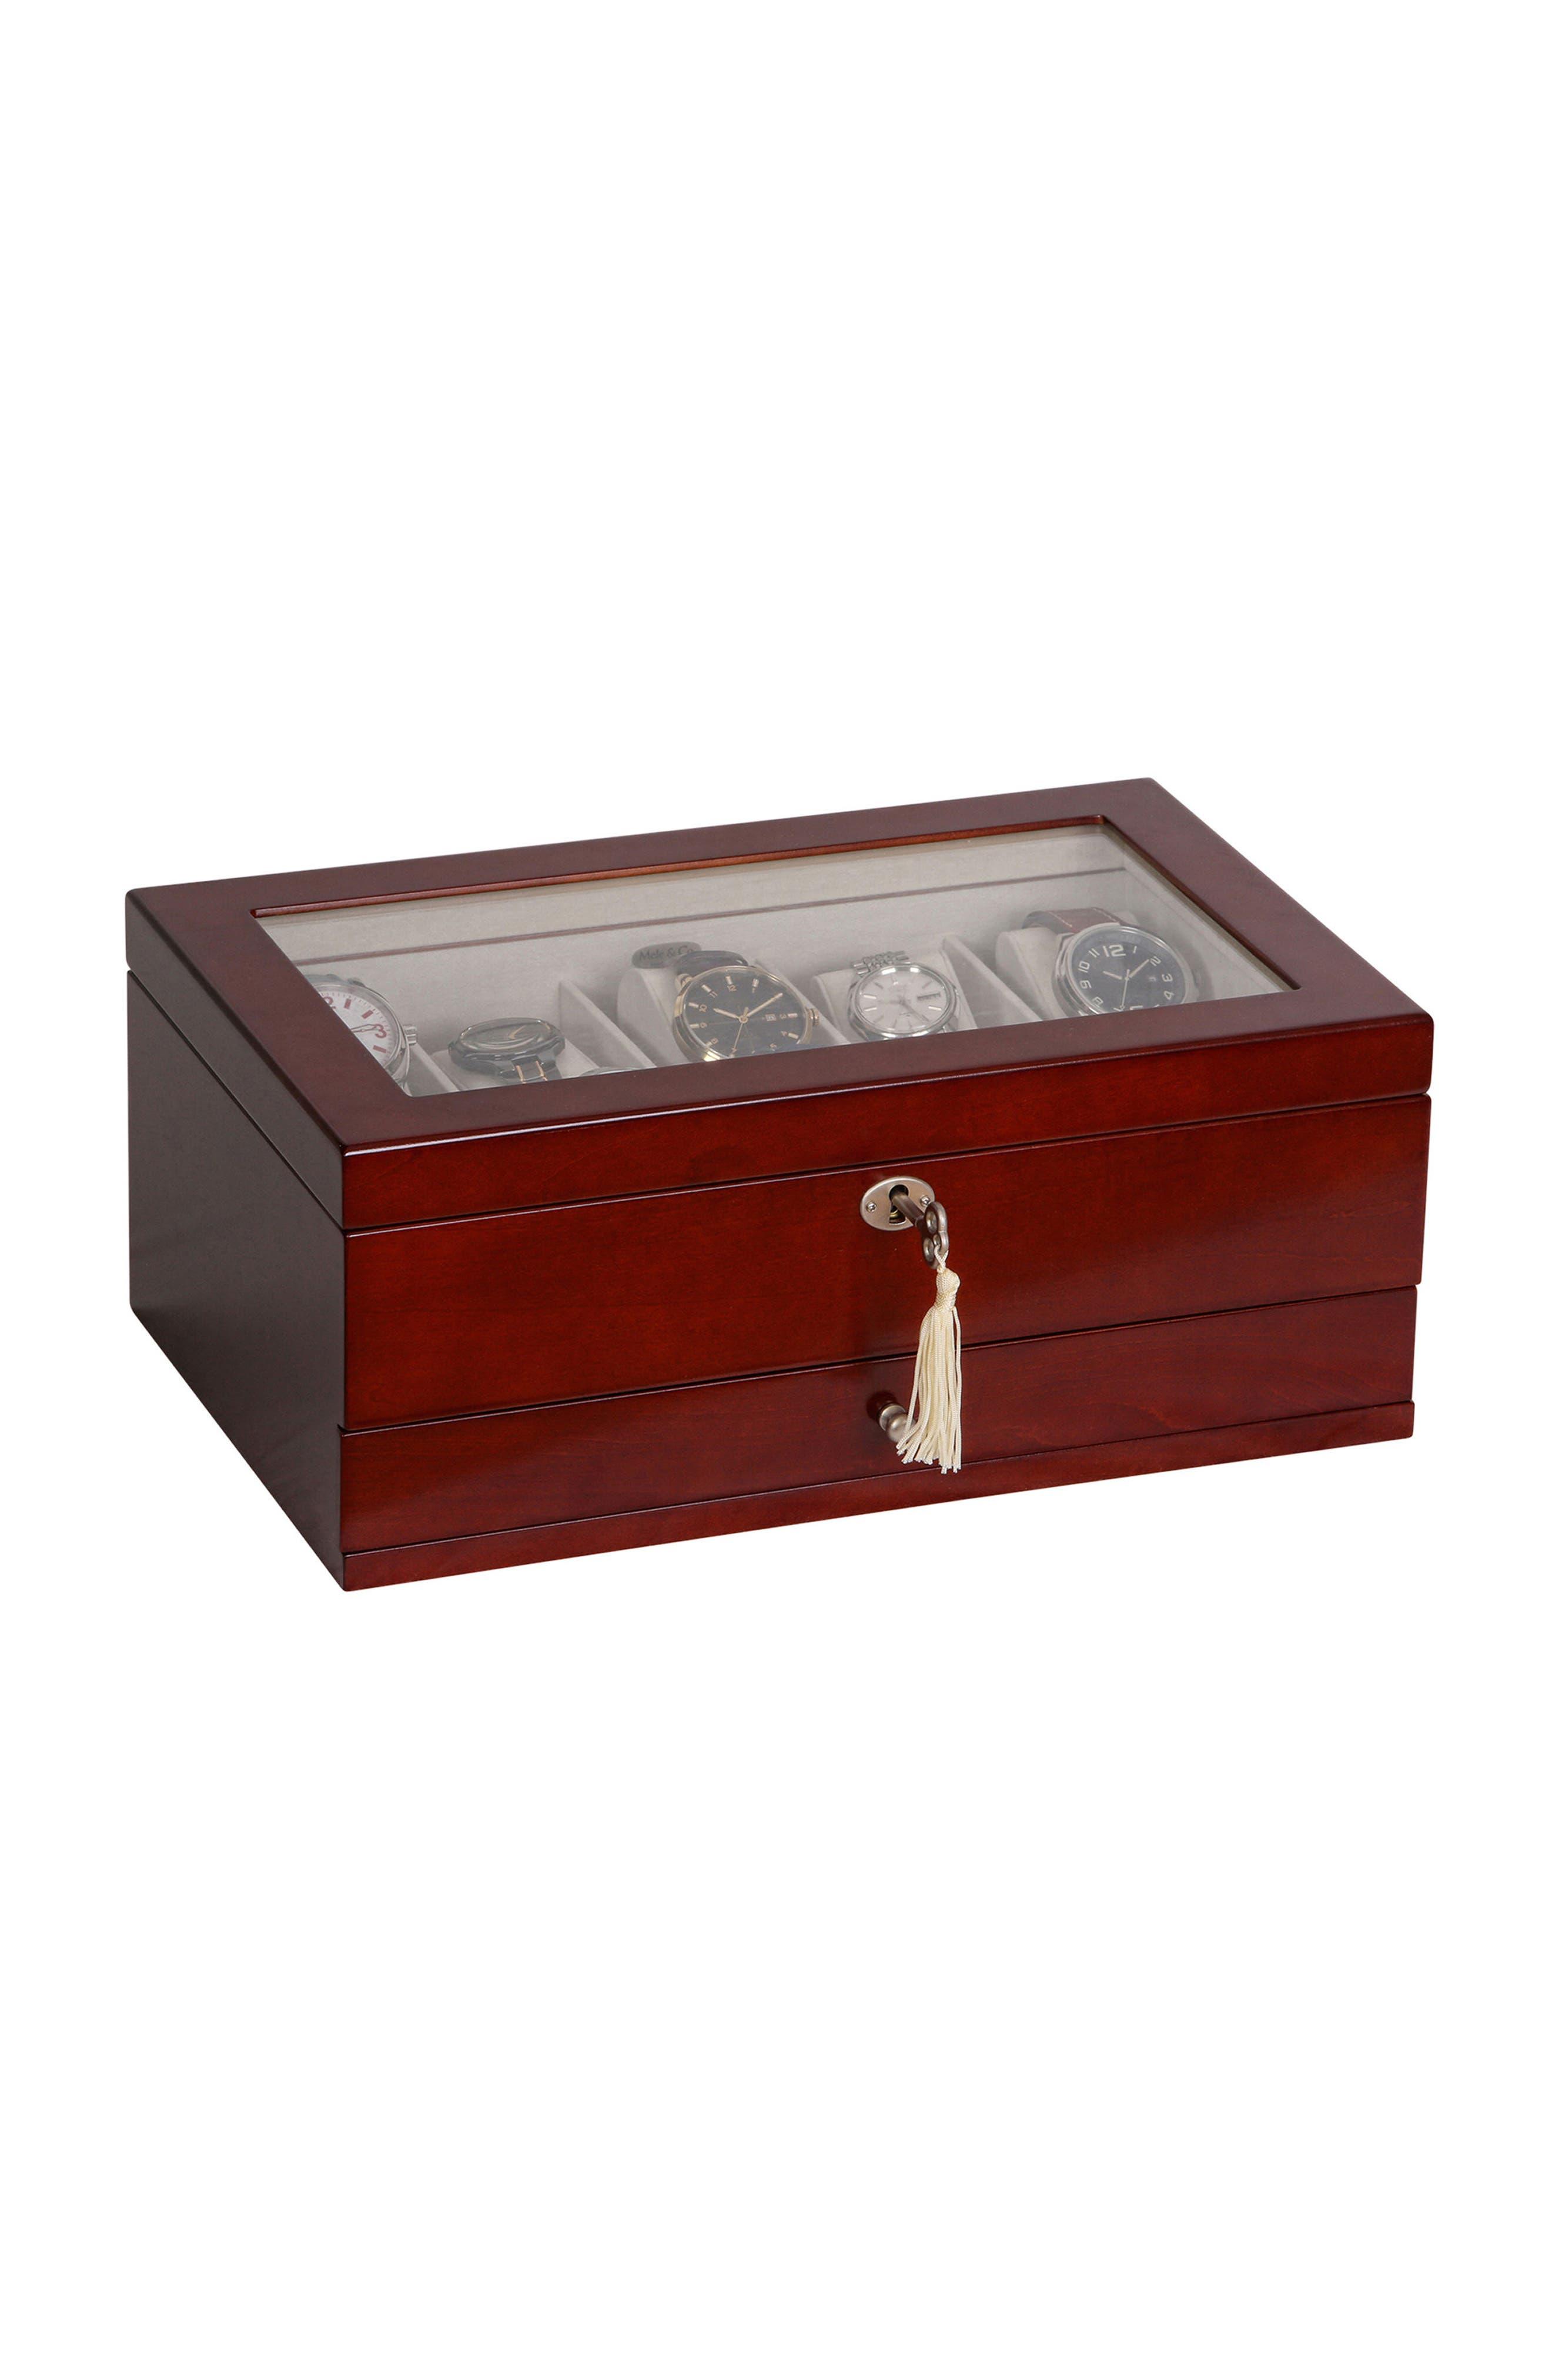 Mele & Co. Christo Locking Watch & Jewelry Box